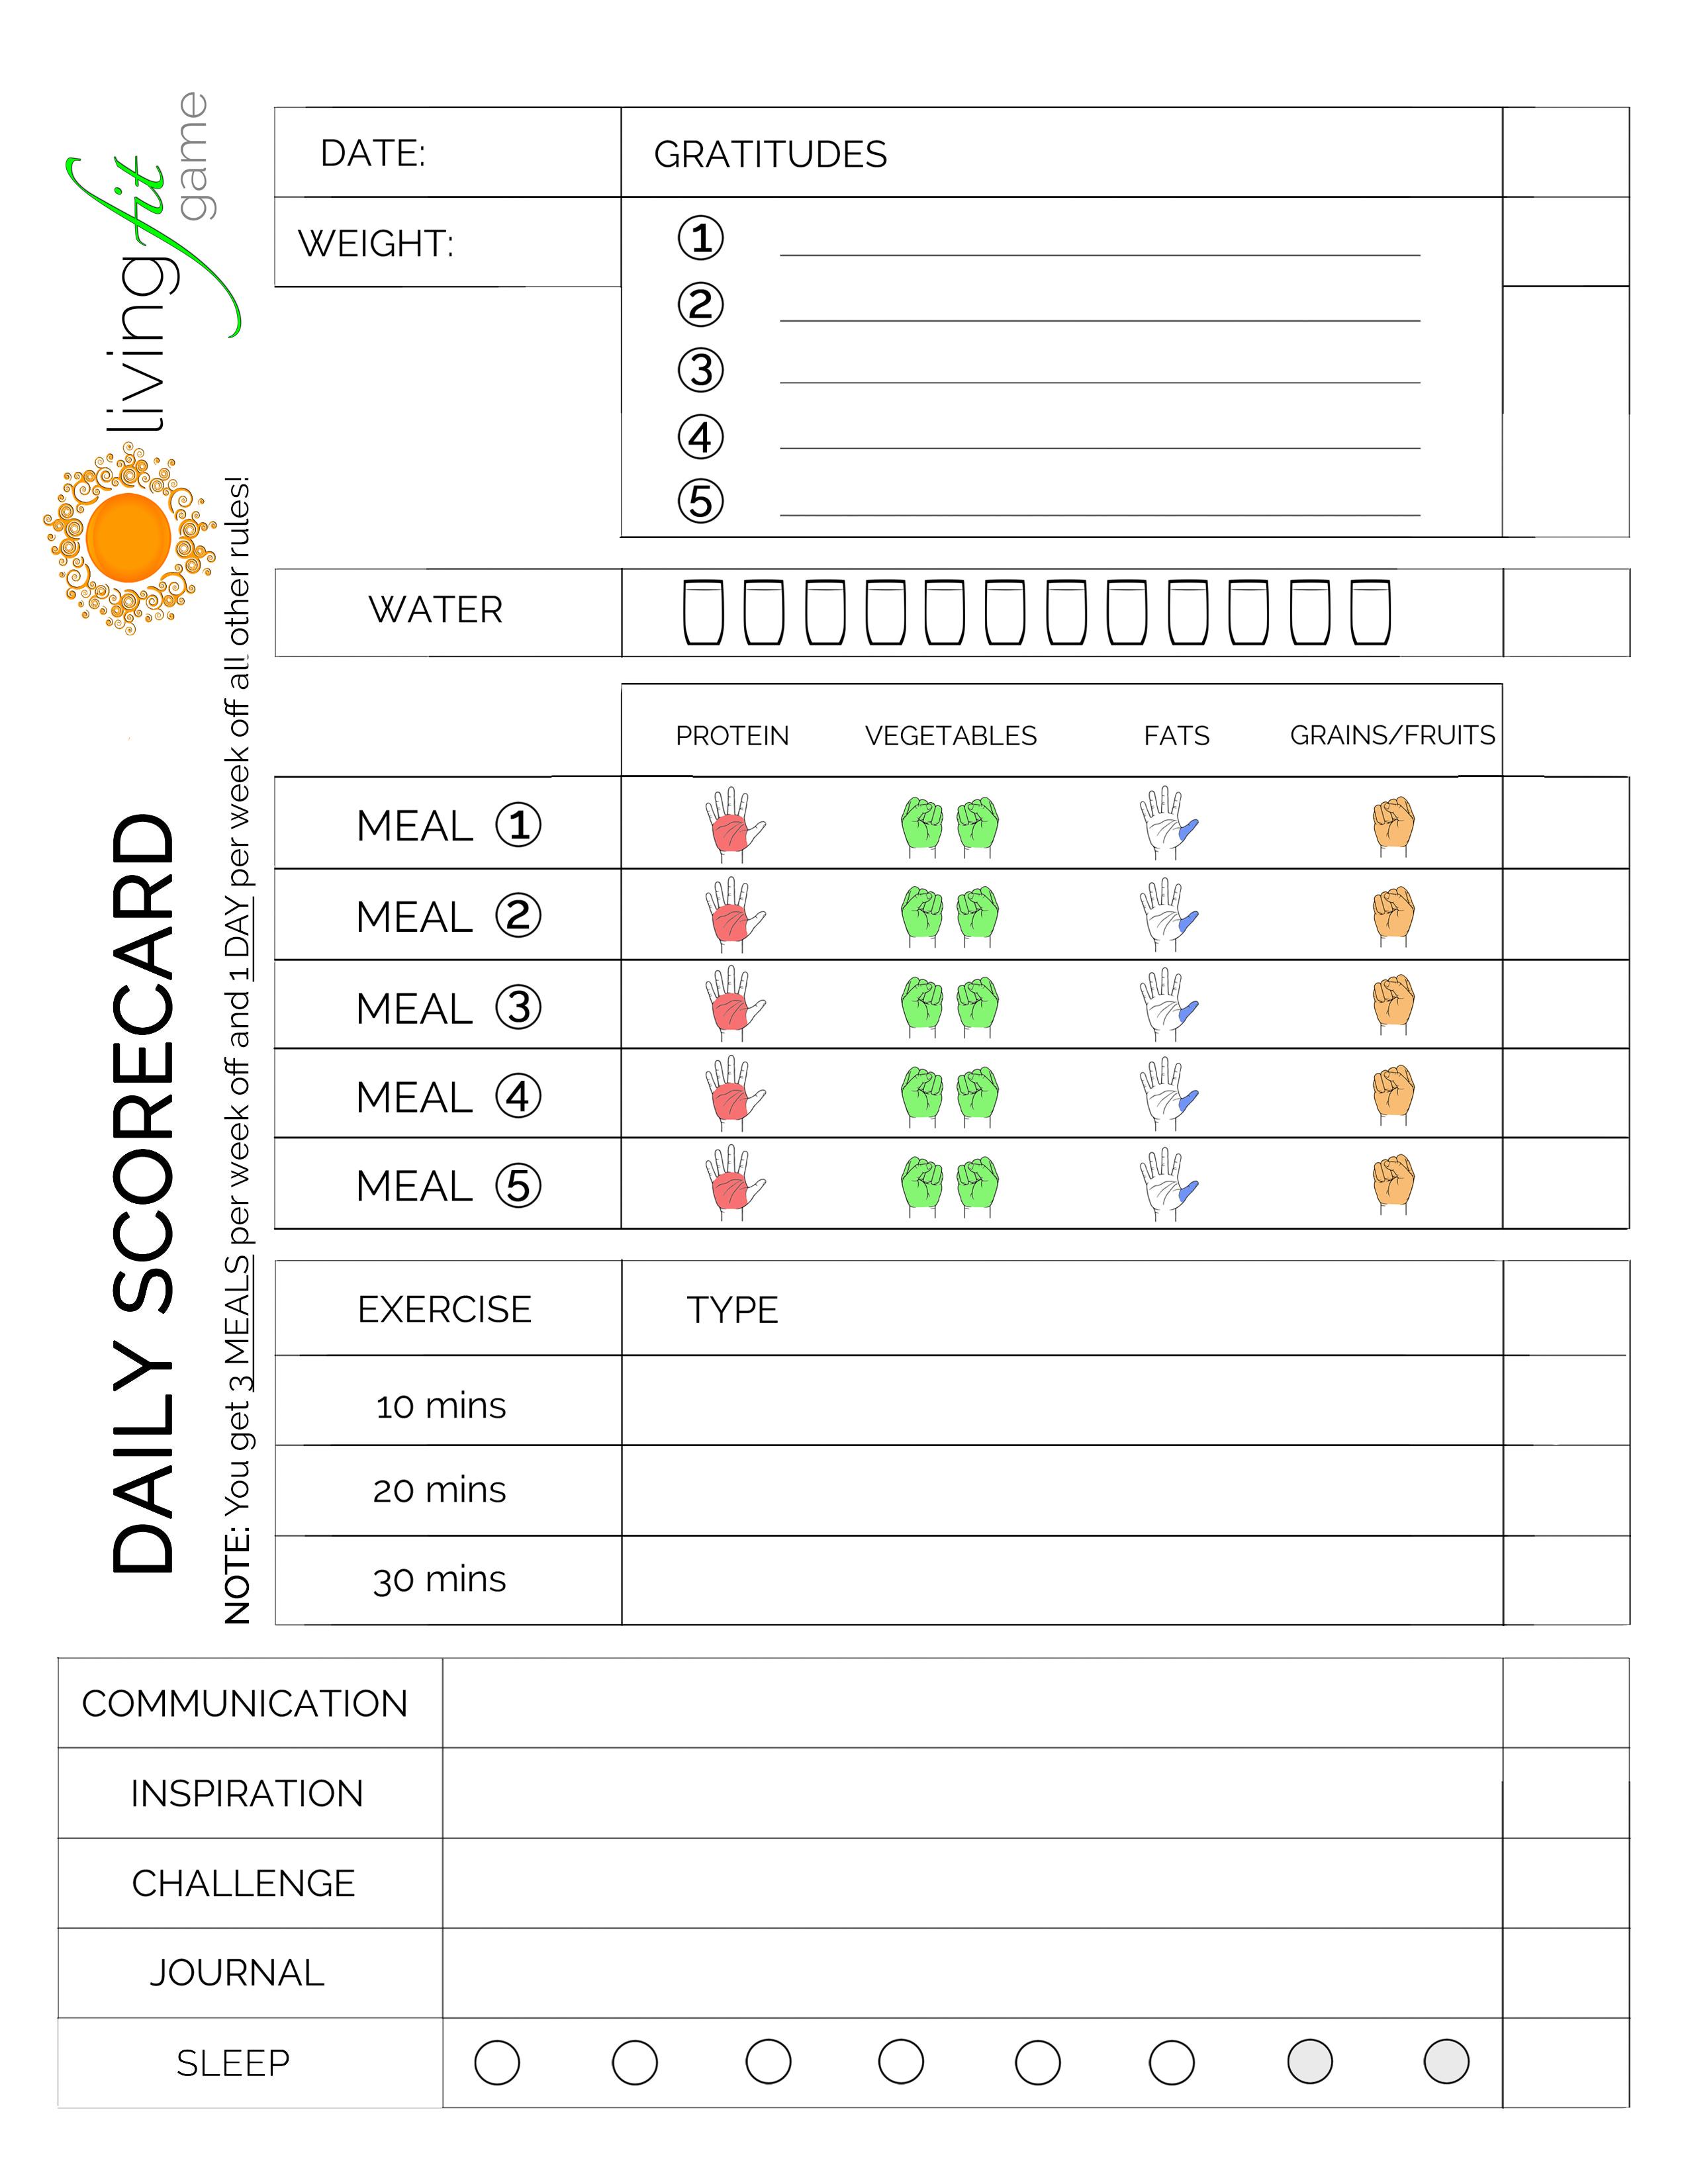 Daily Scorecard